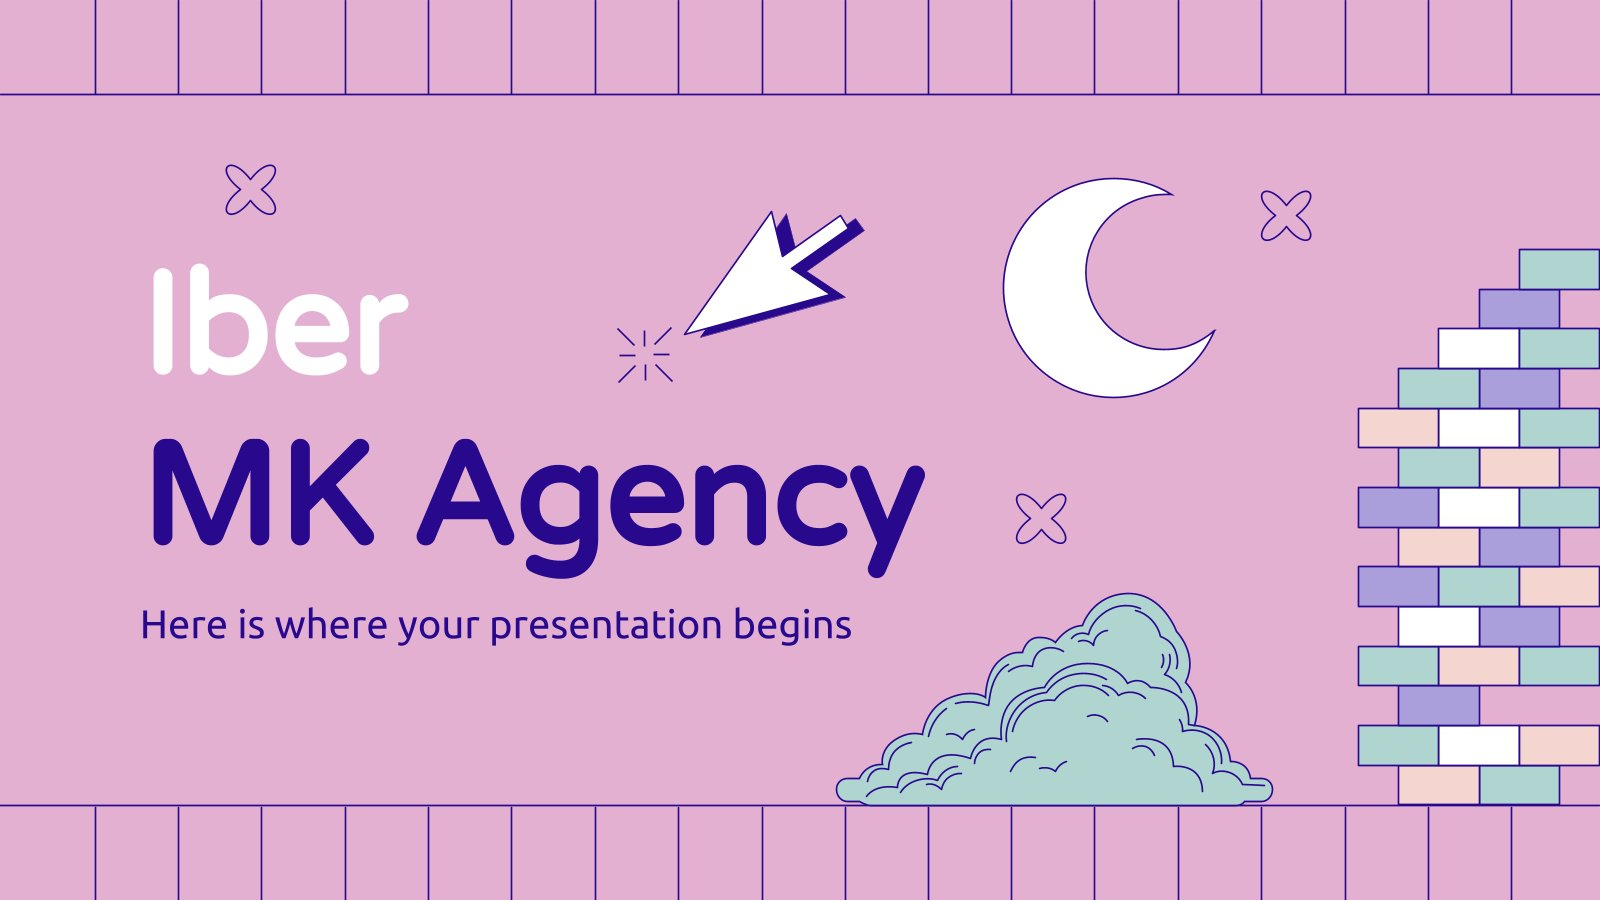 Iber MK Agency presentation template